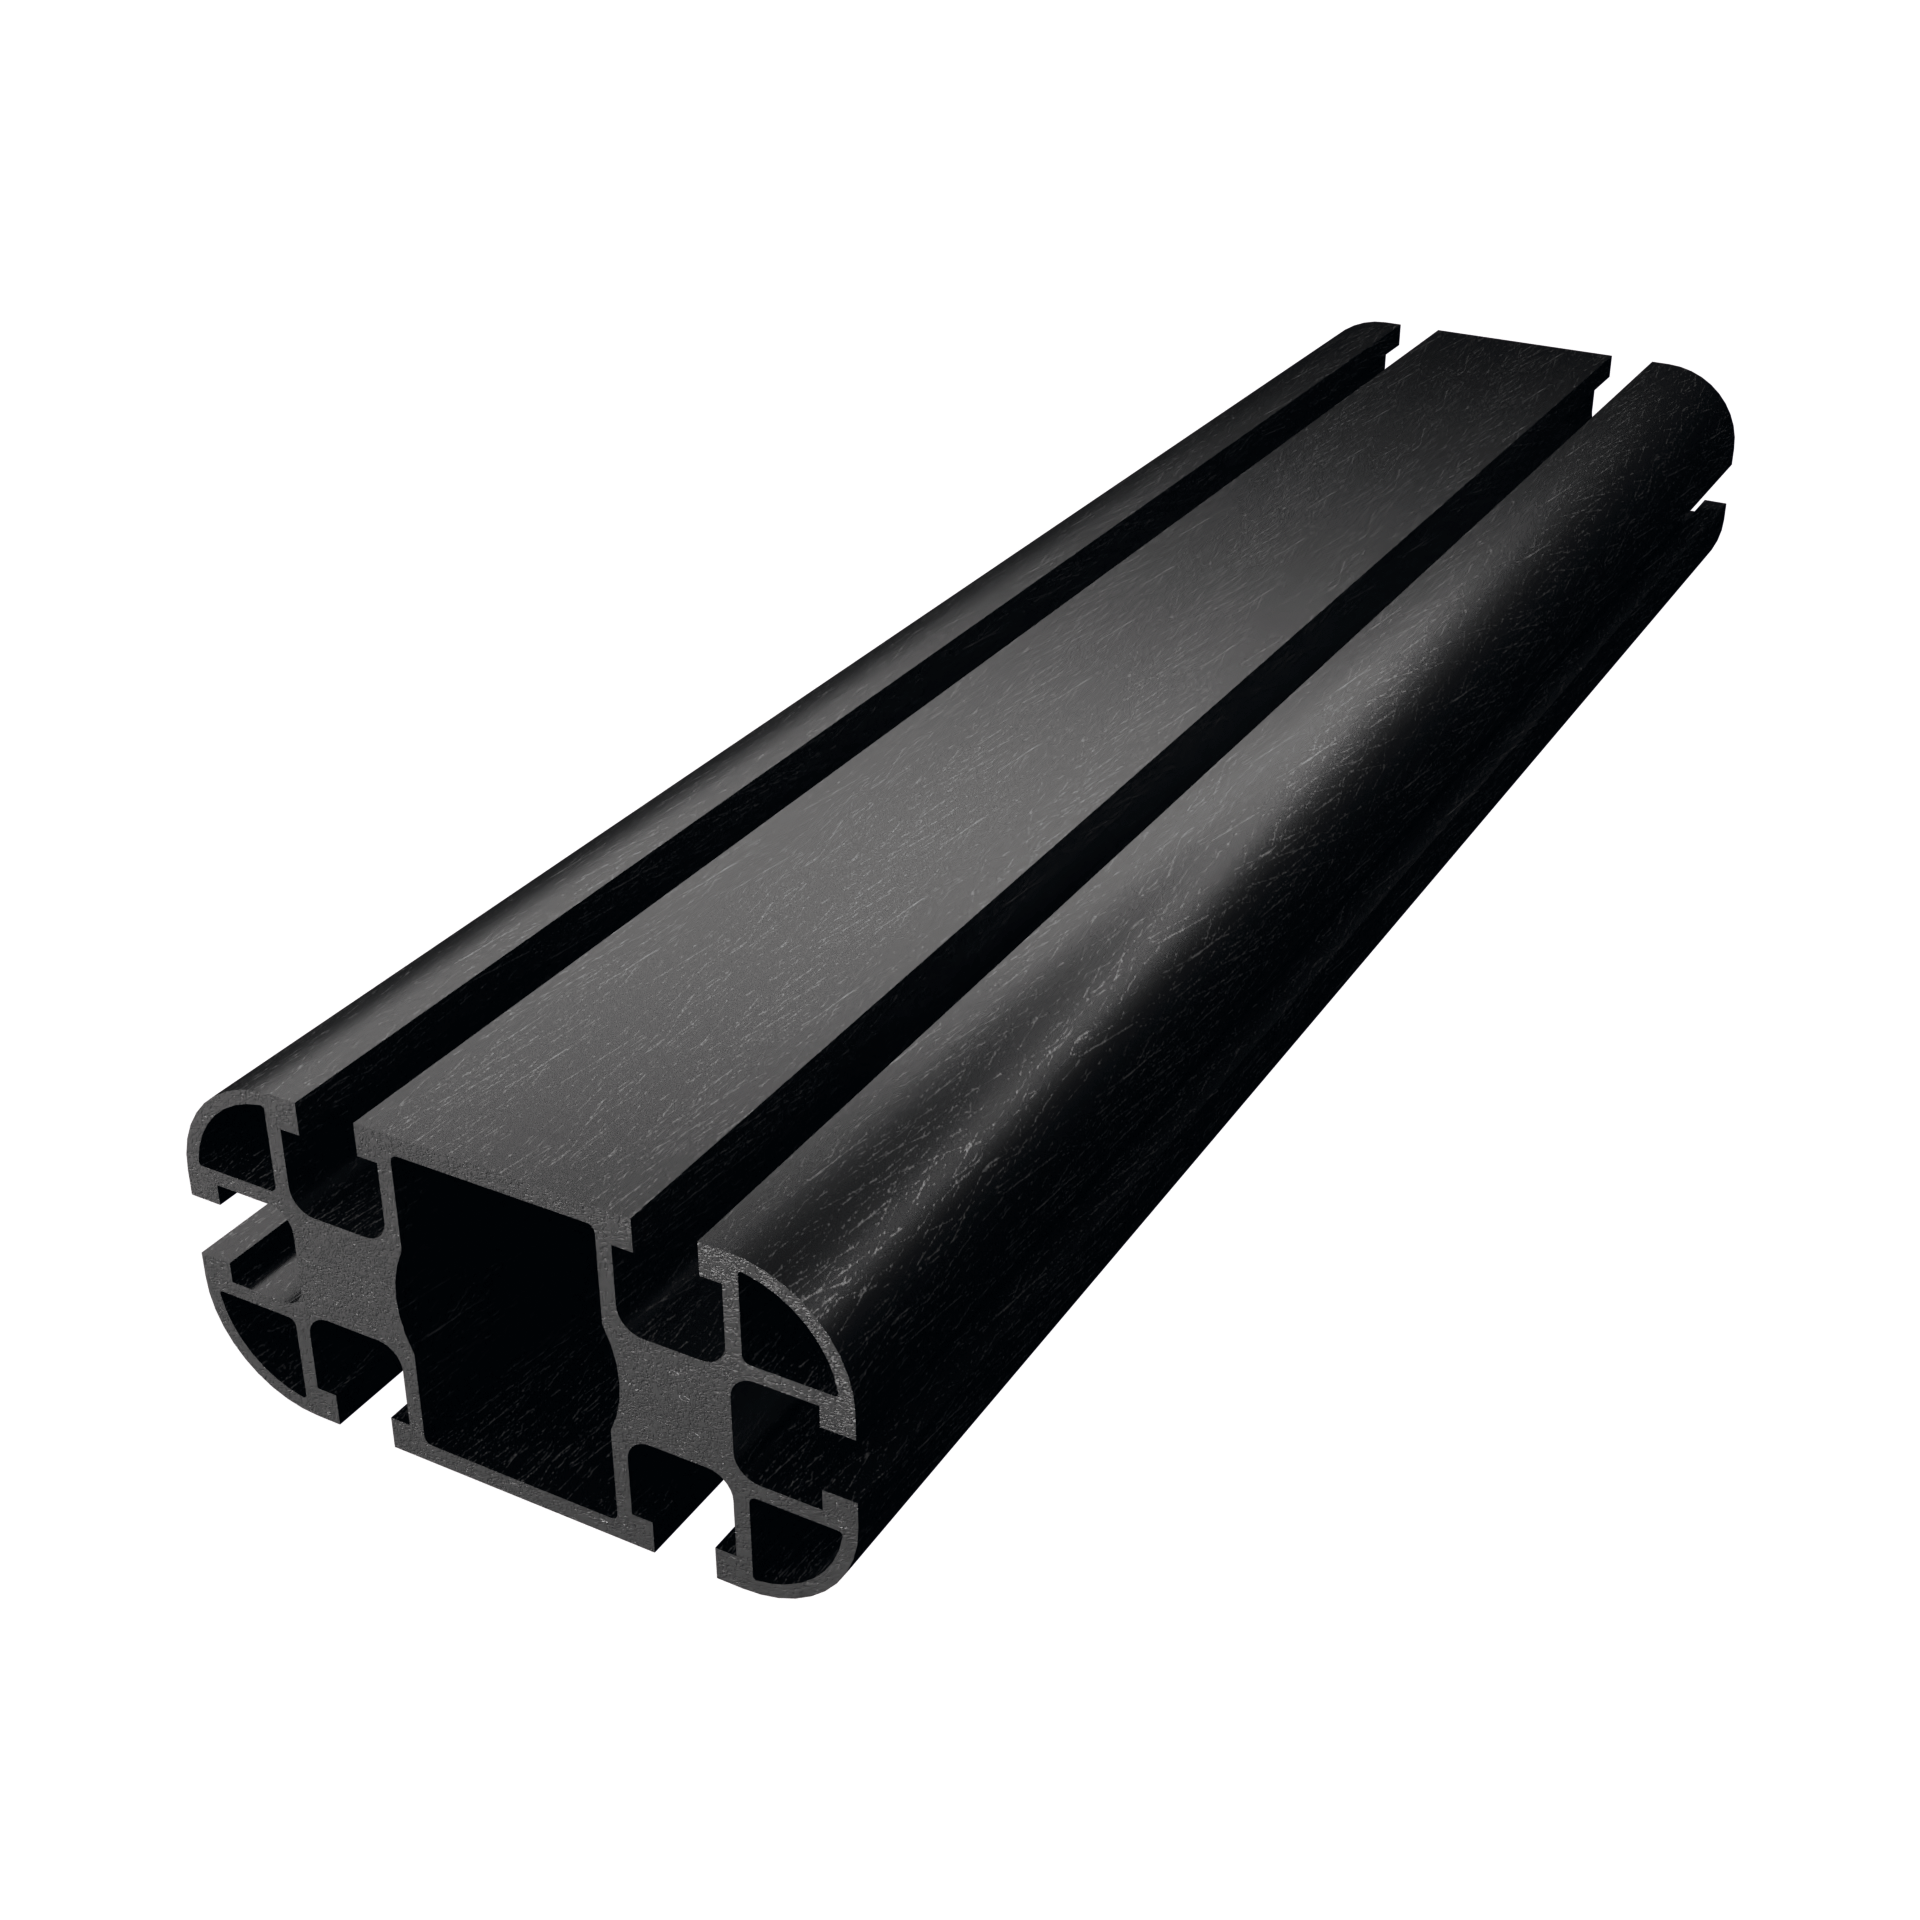 CarboSix carbon fibre profile 45x90